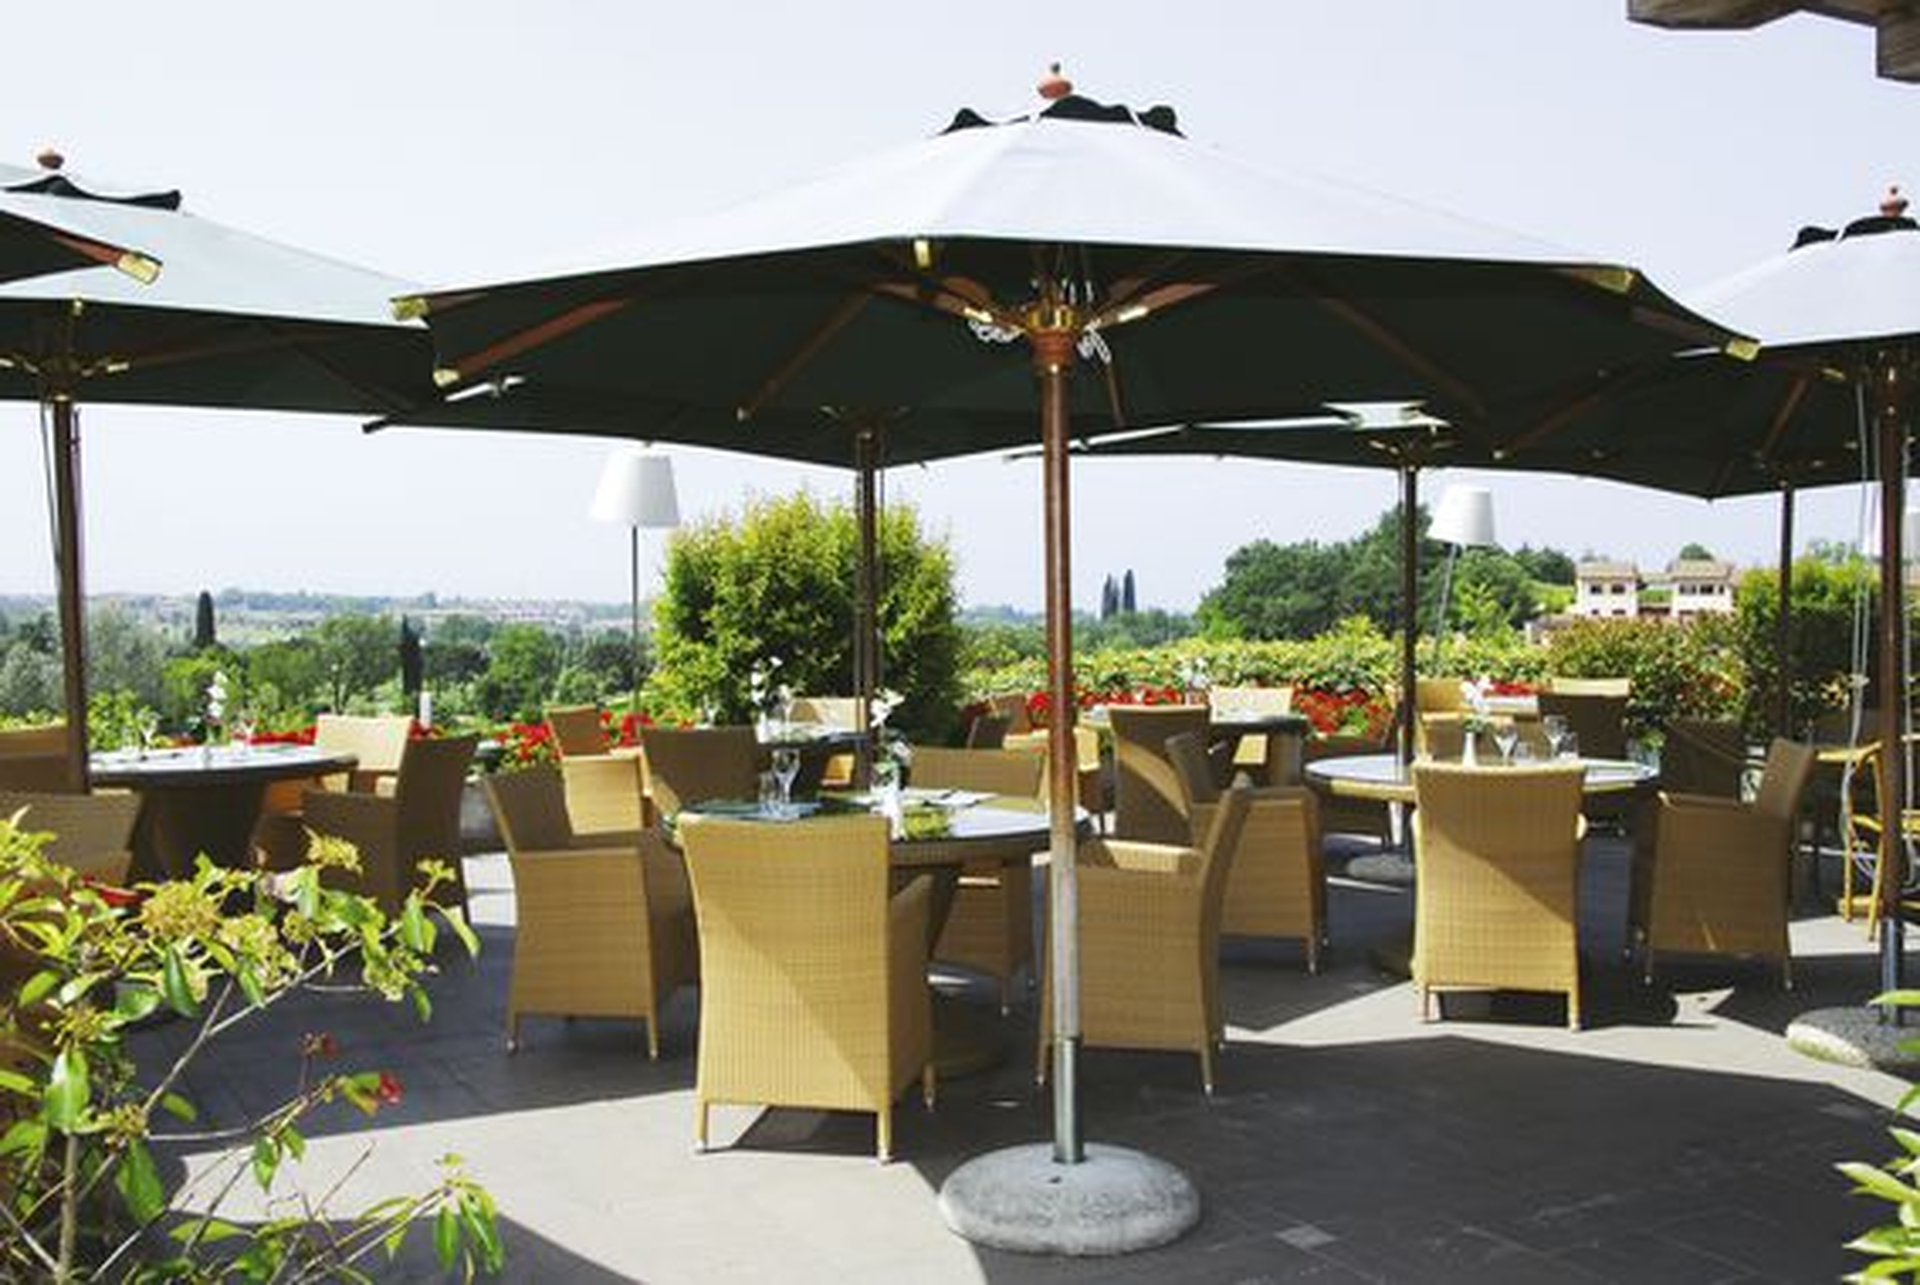 Terrasse in Ihrem 4-Sterne-Active Hotel Paradiso & Golf